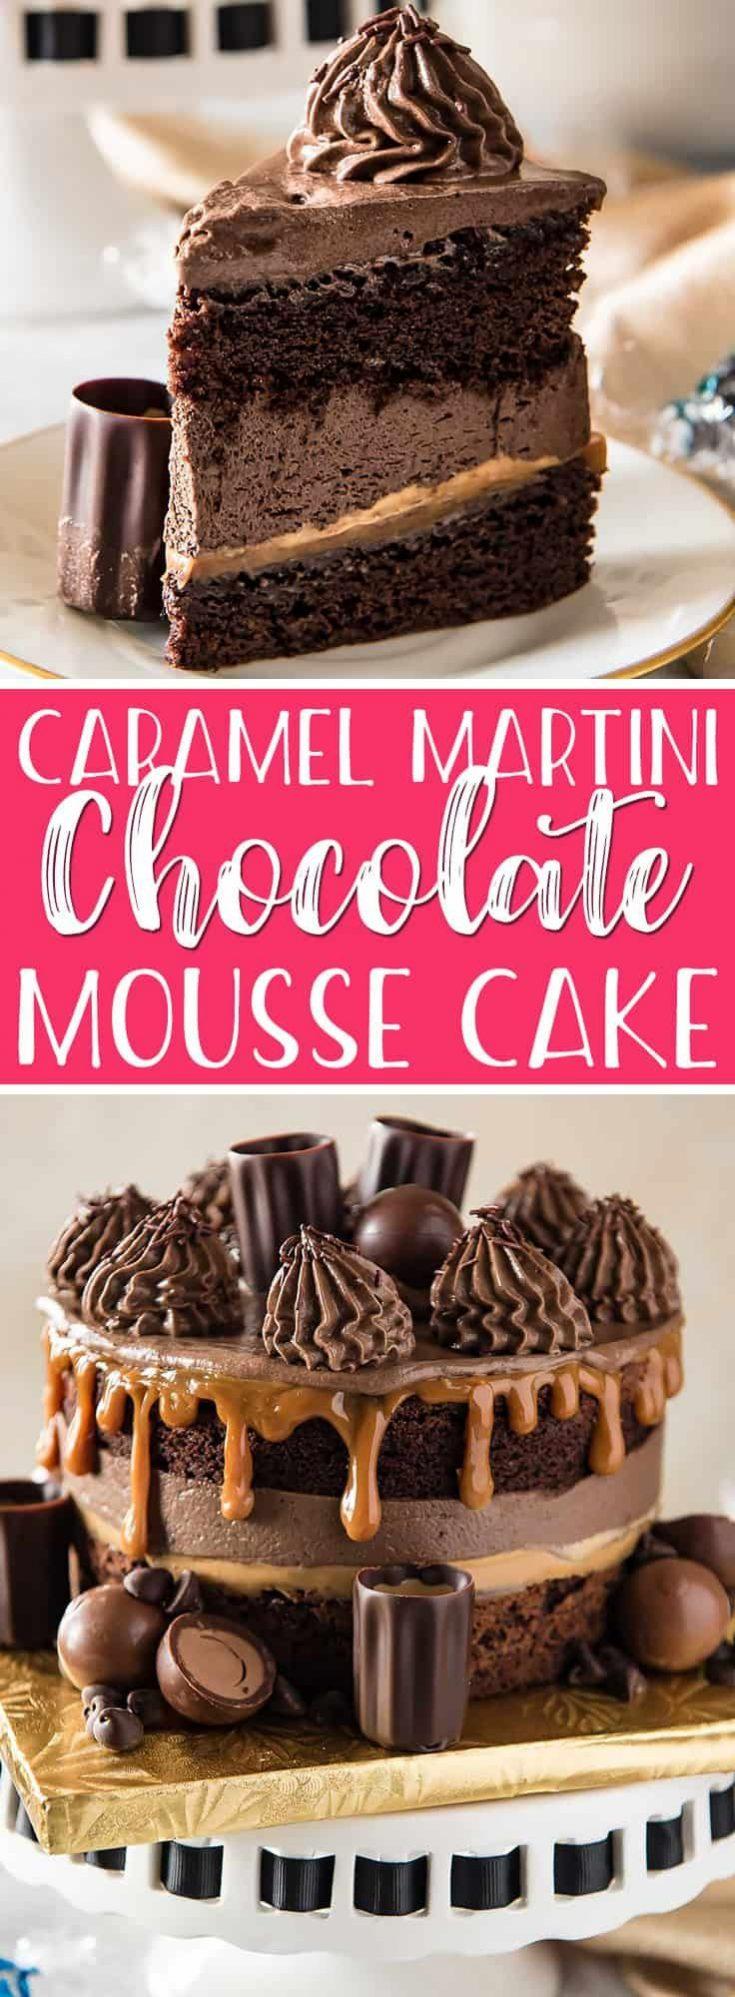 Caramel Martini Chocolate Mousse Cake